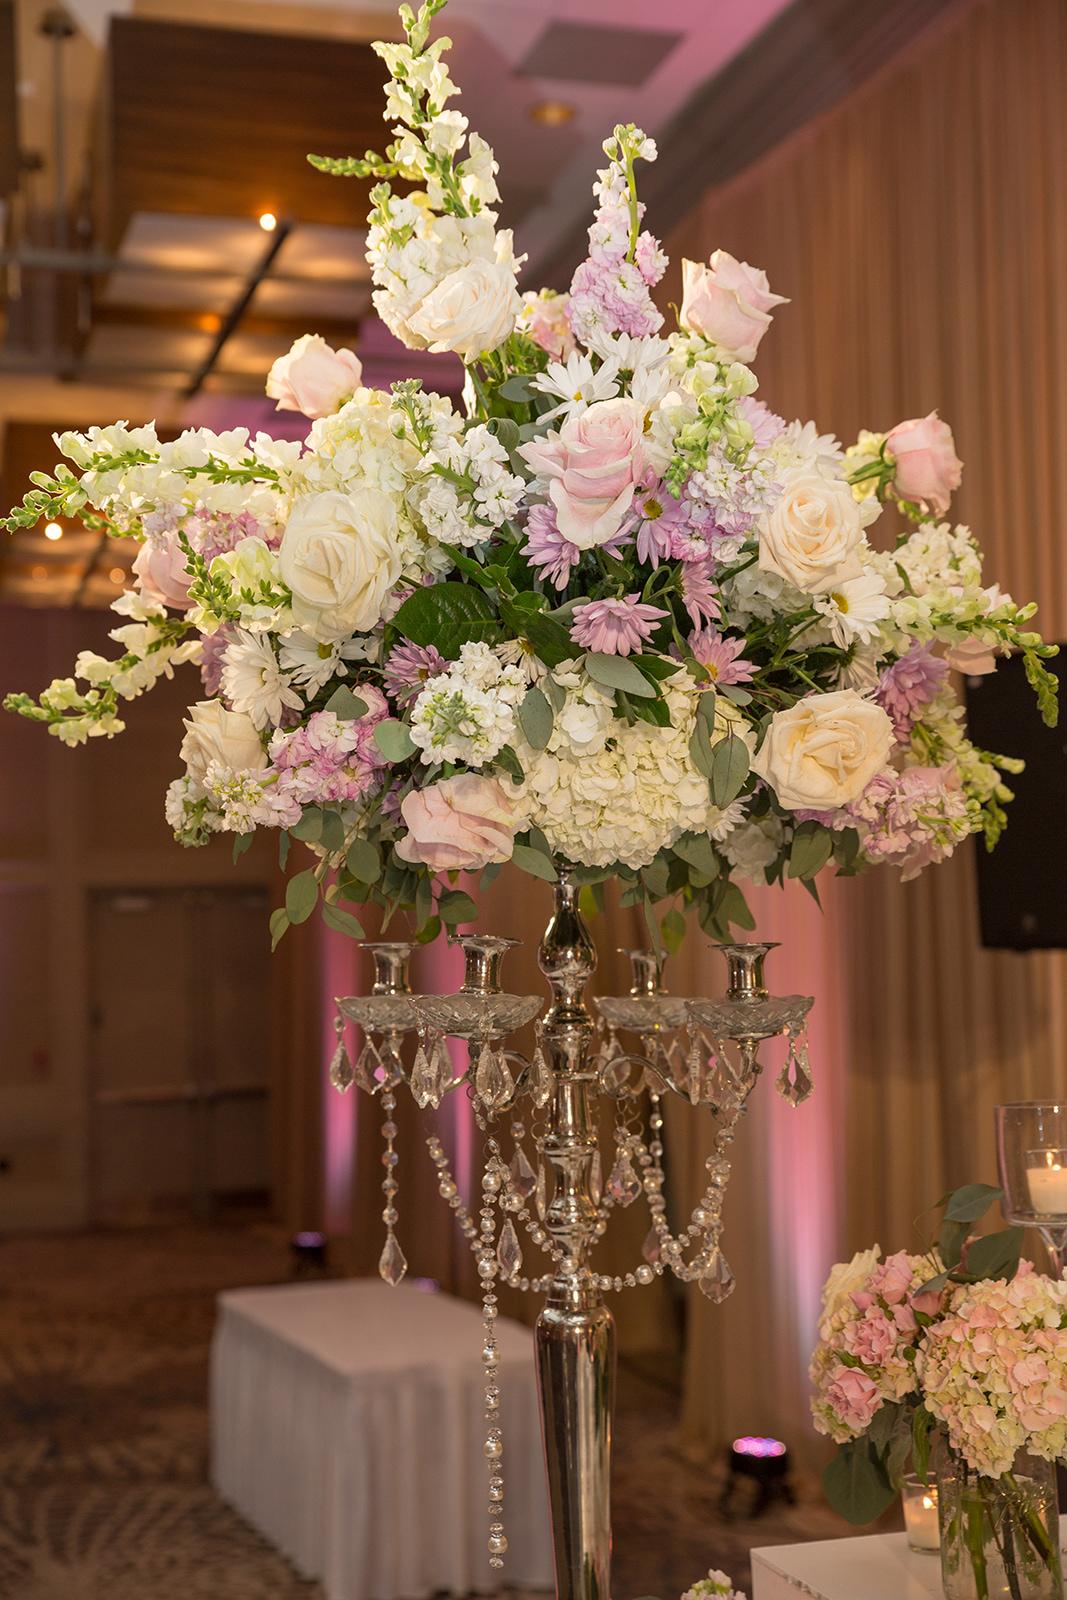 Le Cape Weddings - Sumeet and Chavi - Reception Details  -51.jpg